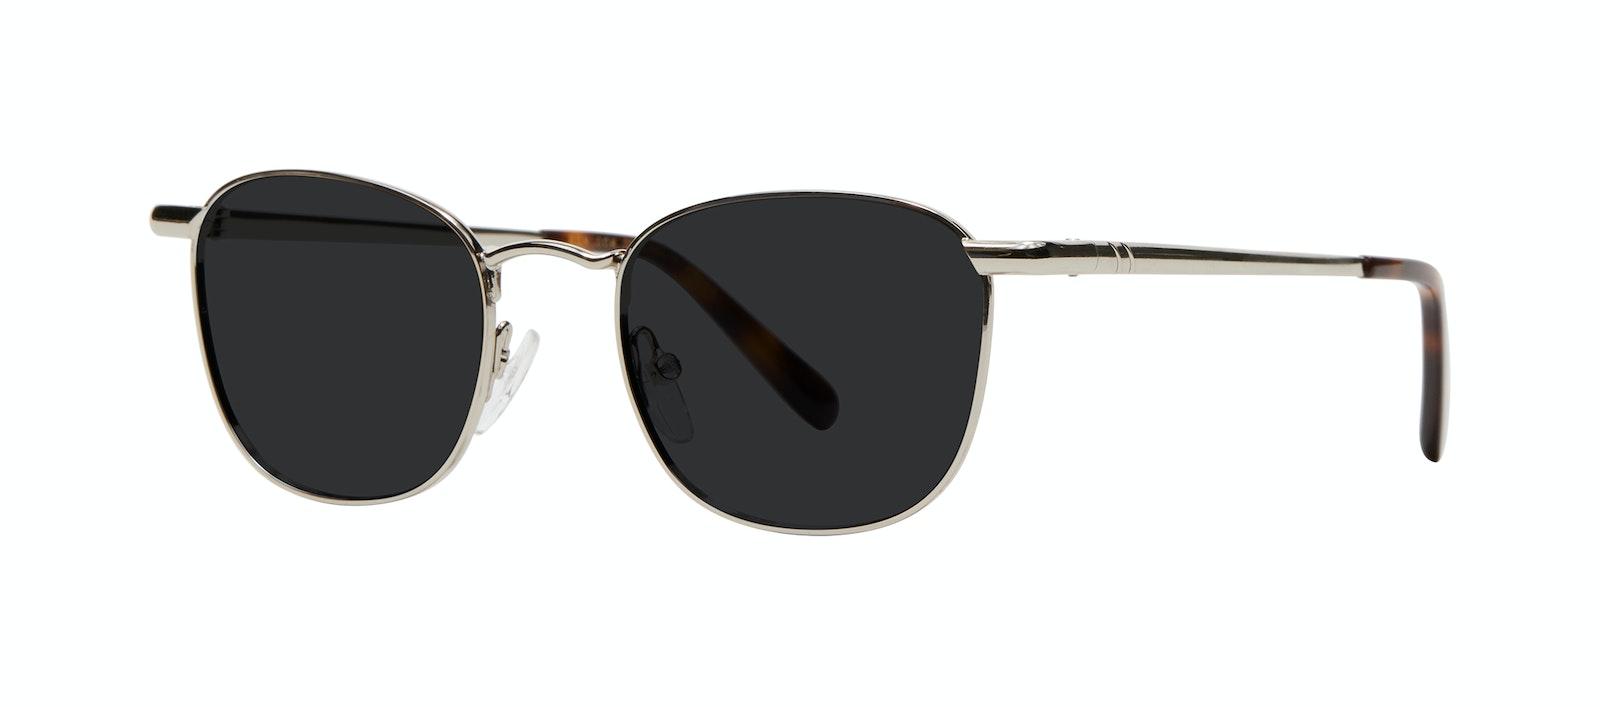 Affordable Fashion Glasses Square Sunglasses Men Women Apex M Silver Tilt